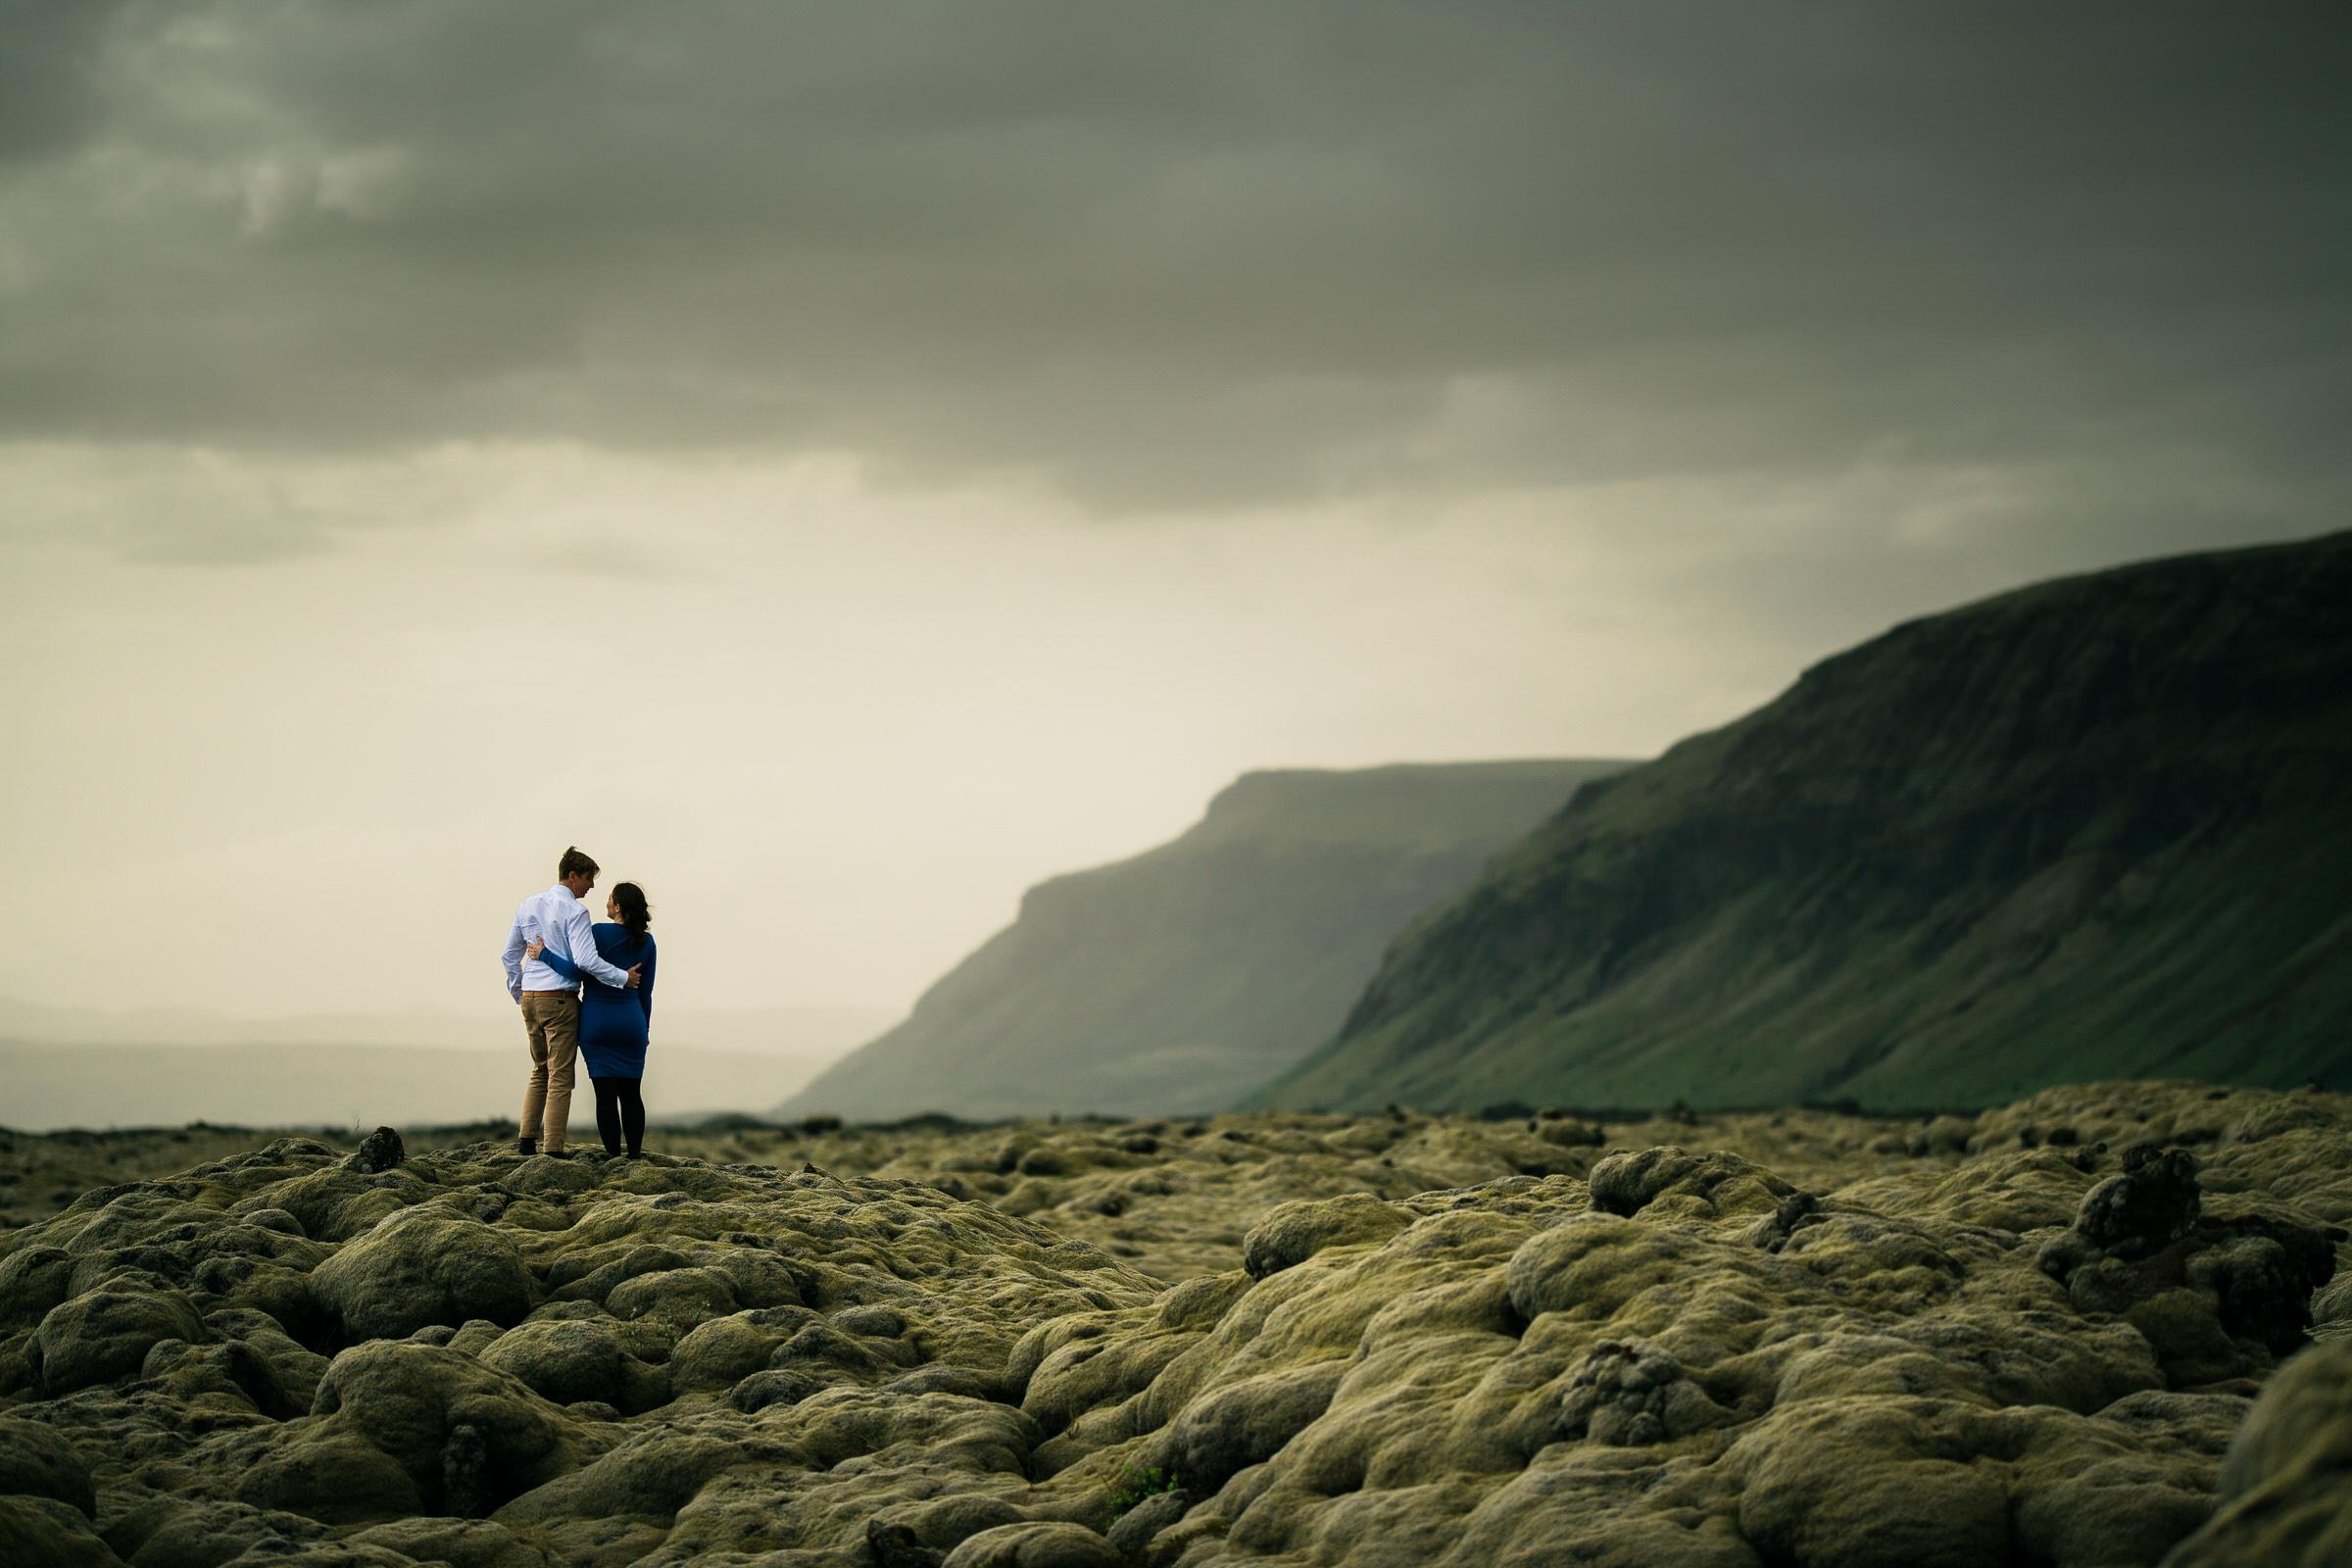 Elopement couple in stormy Icelandic landscape - photo by M&J Studios